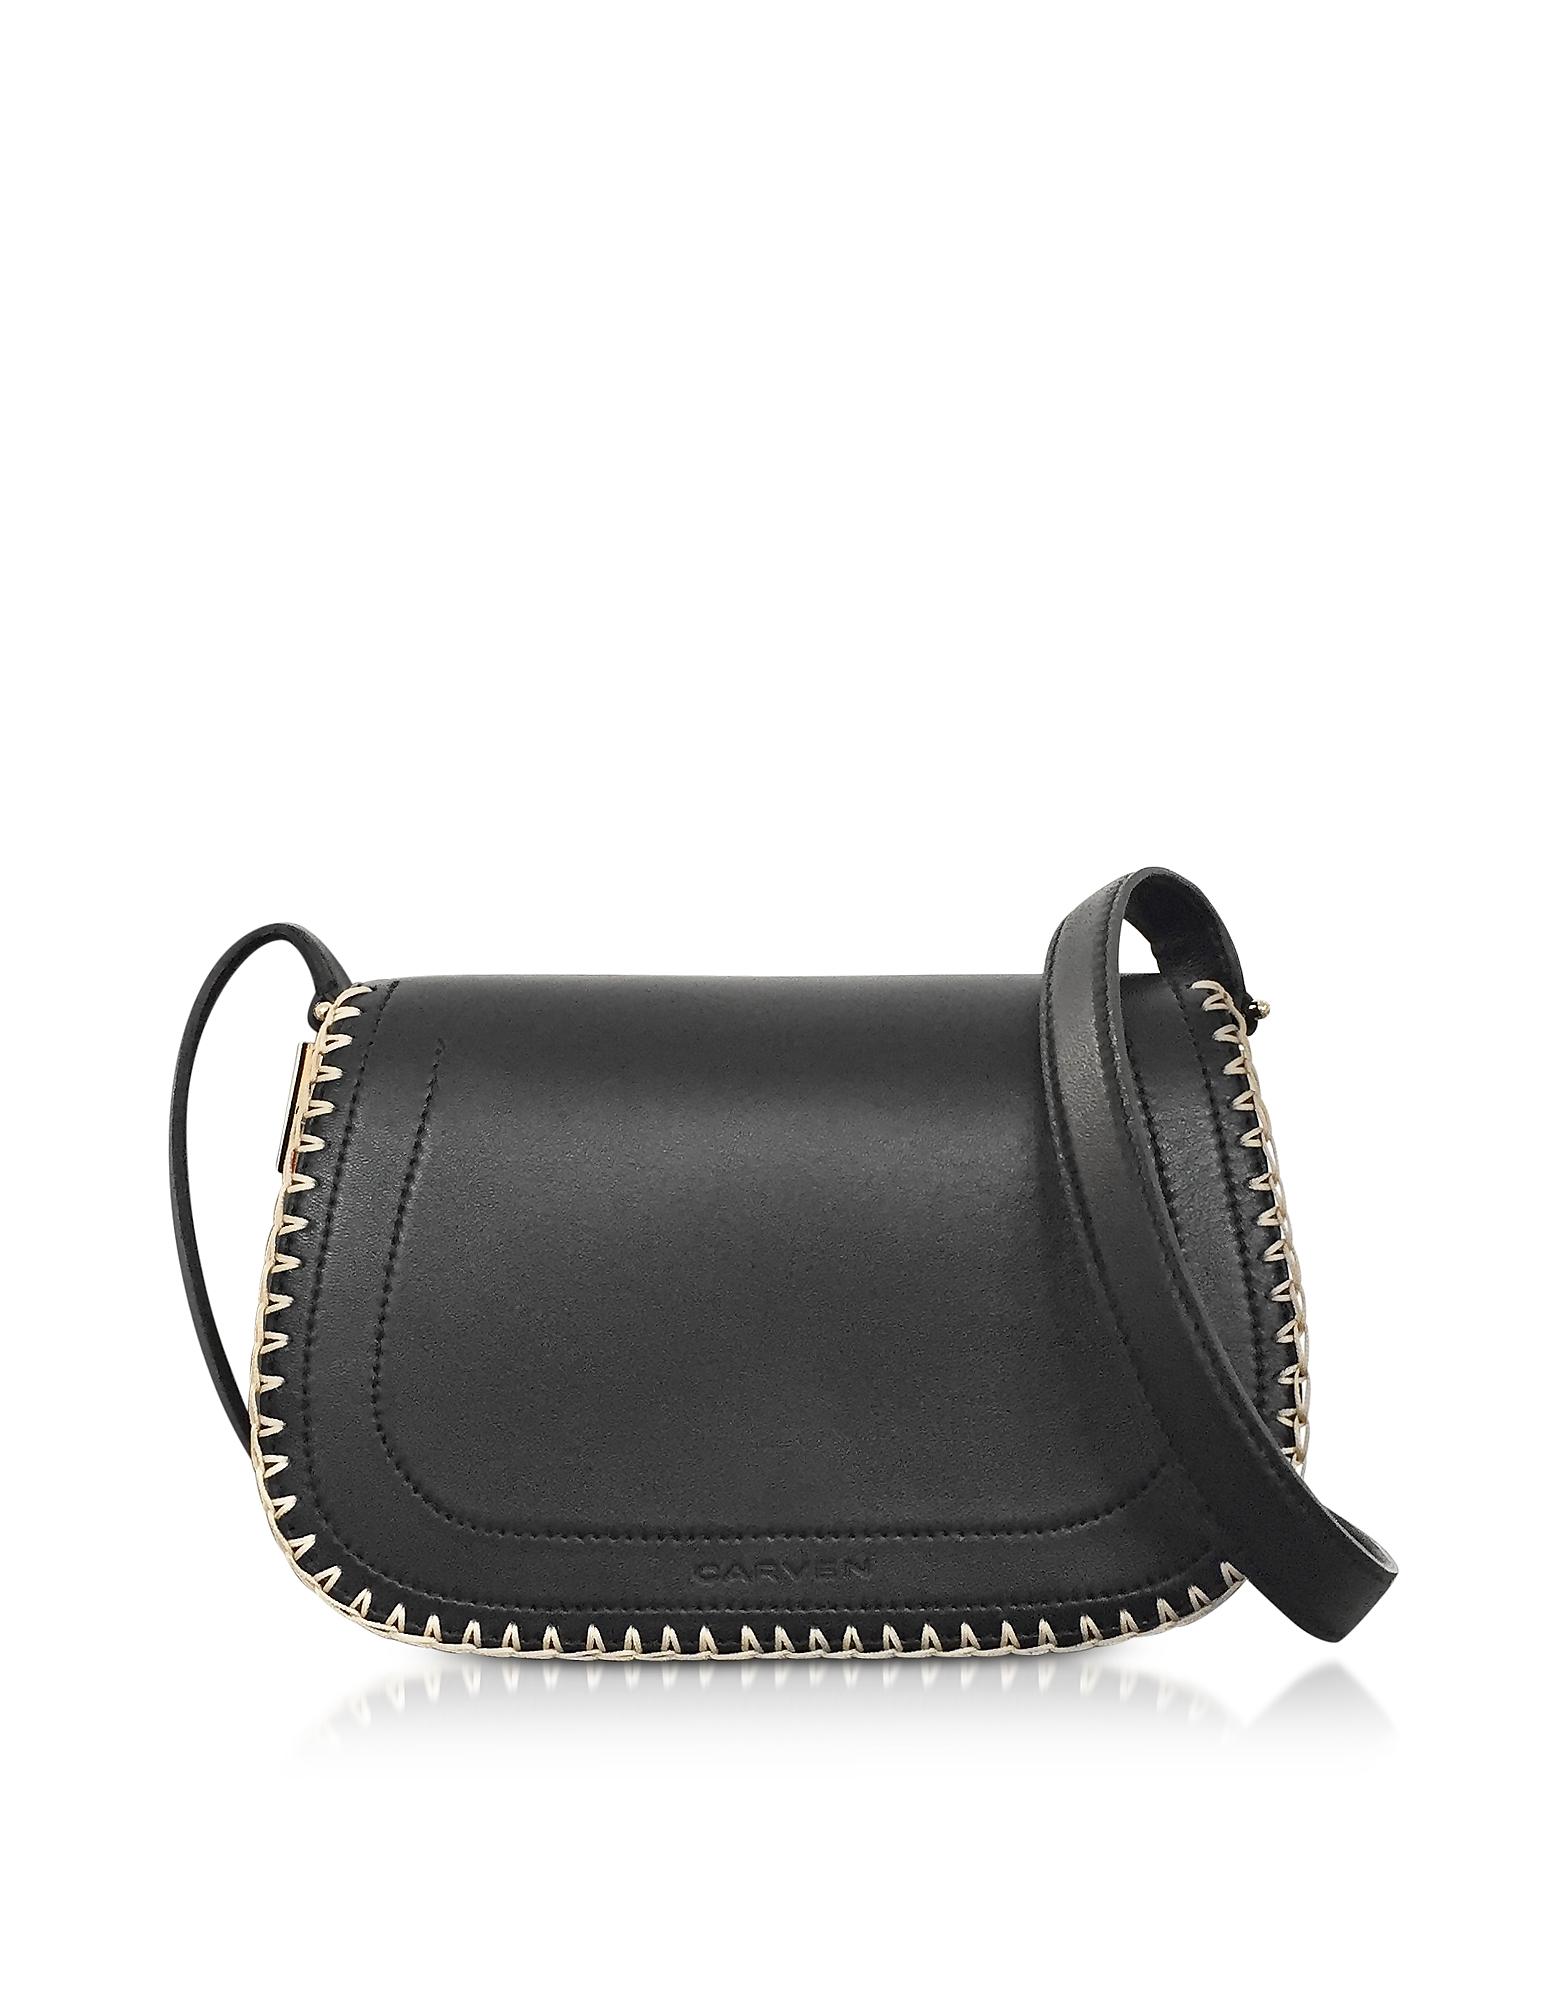 Carven Handbags, Mazarine Black Leather Crossbody Bag